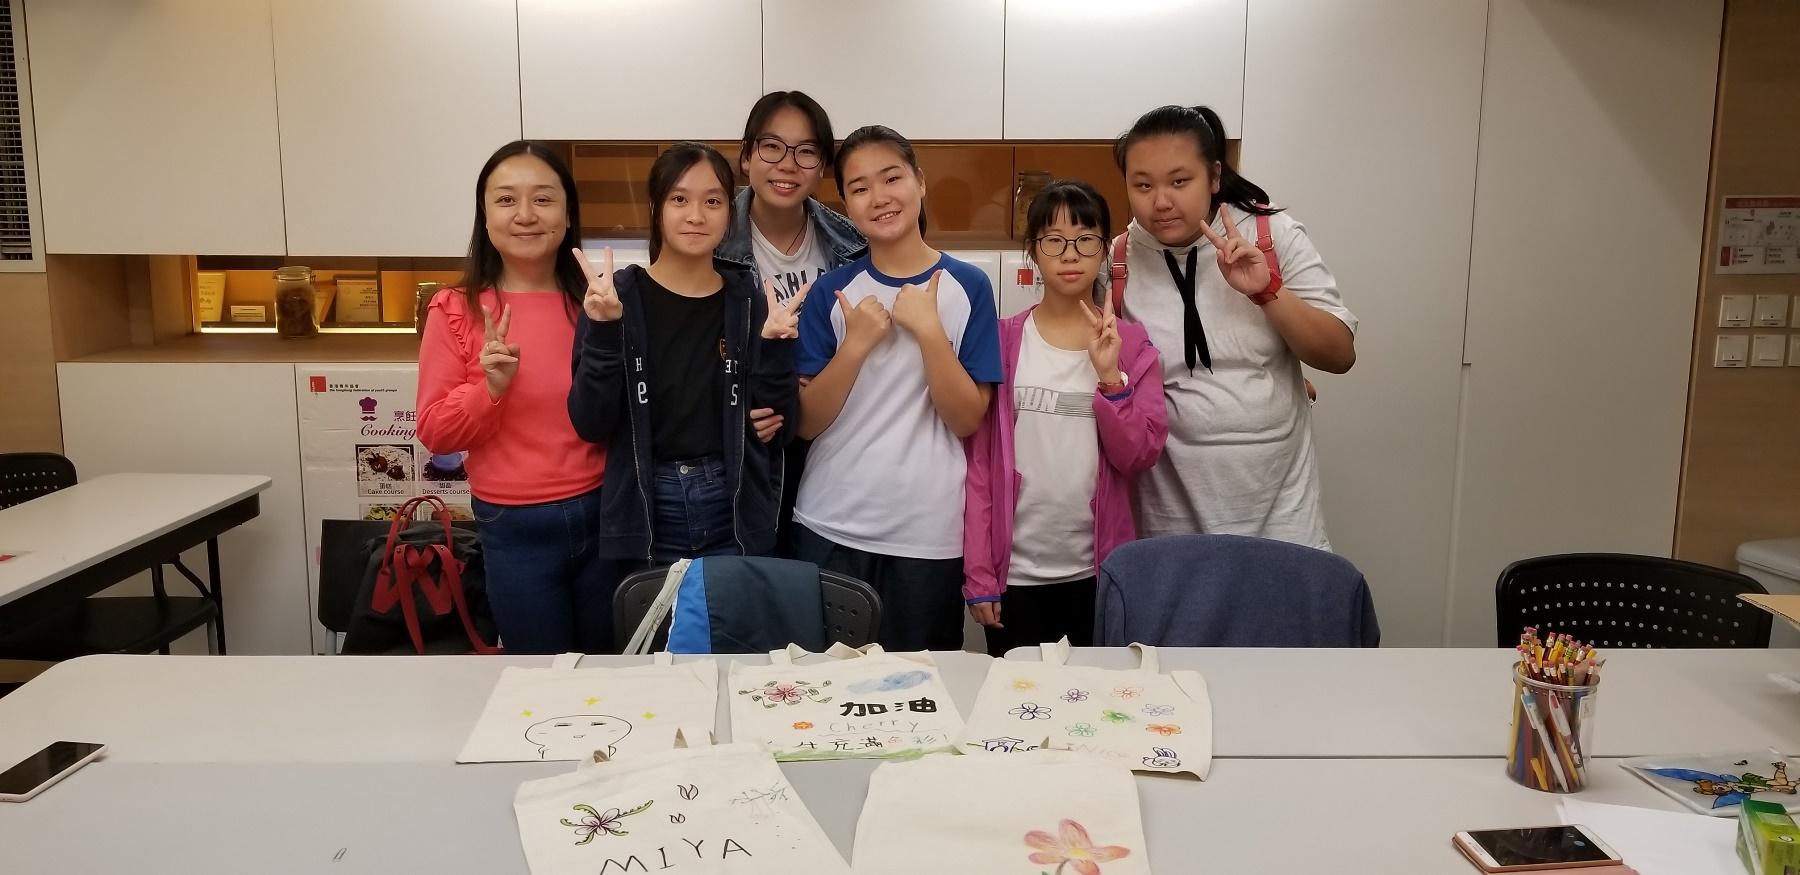 http://npc.edu.hk/sites/default/files/20181103_130218.jpg